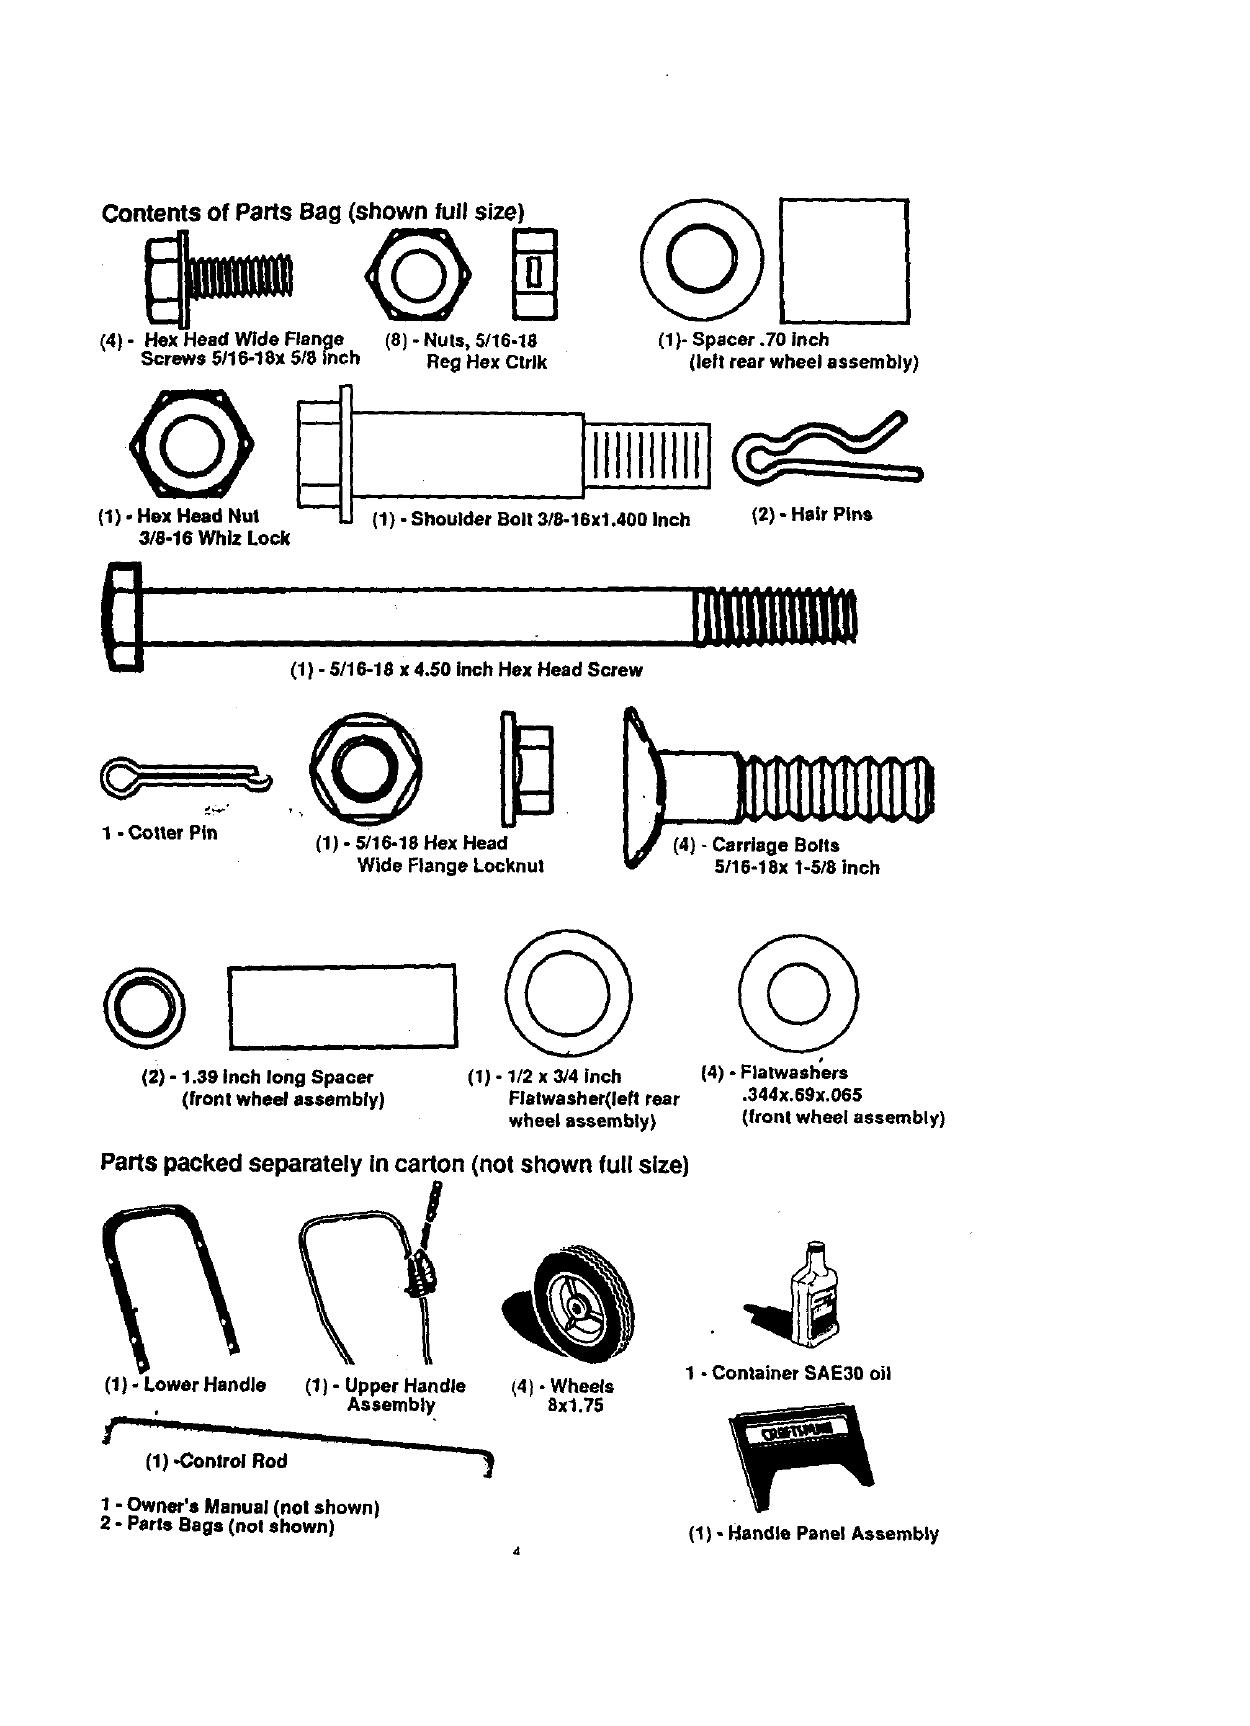 Craftsman 536797480 User Manual 3.8 HP 9 EDGER/TRIMMER